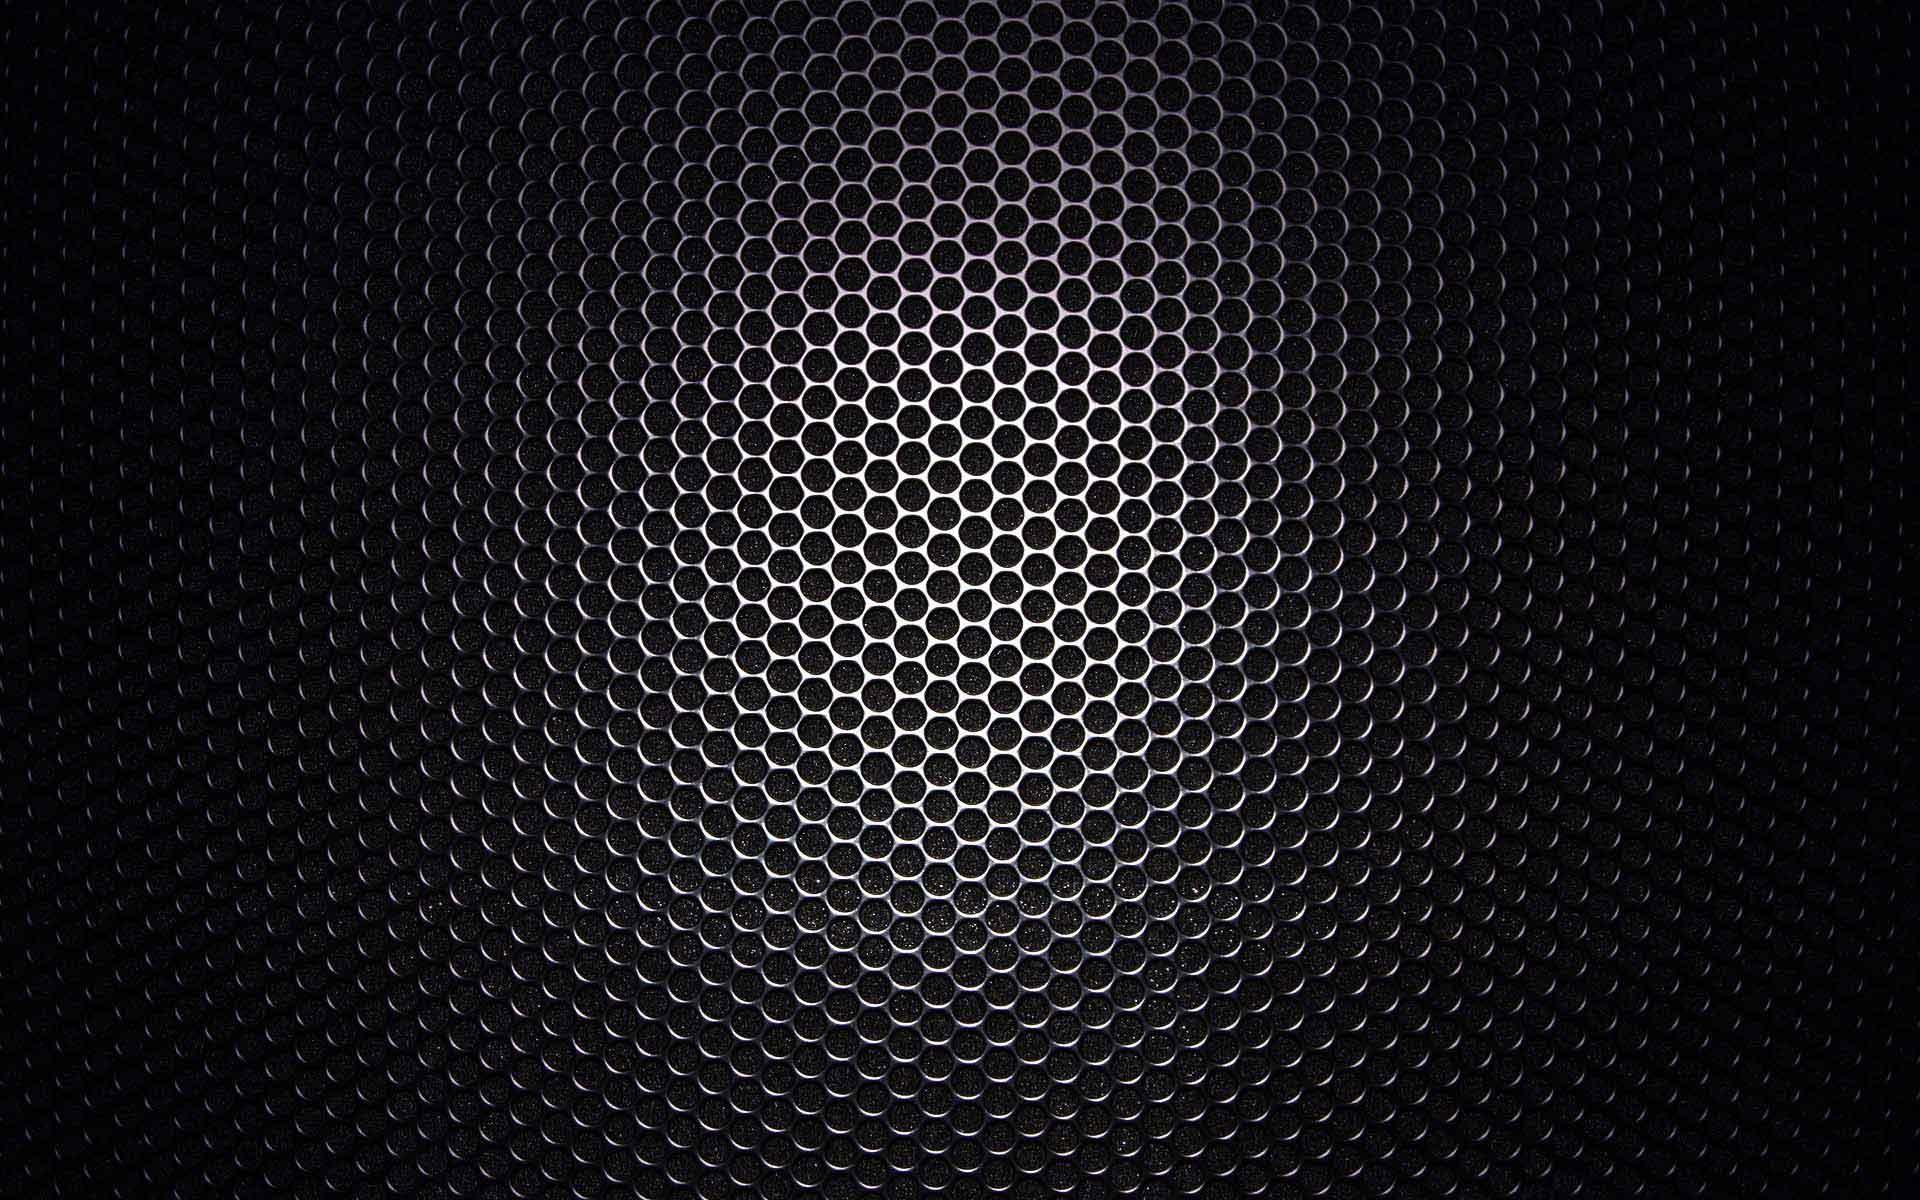 30 HD Black Wallpapers Hd Wallpapers 1920x1200